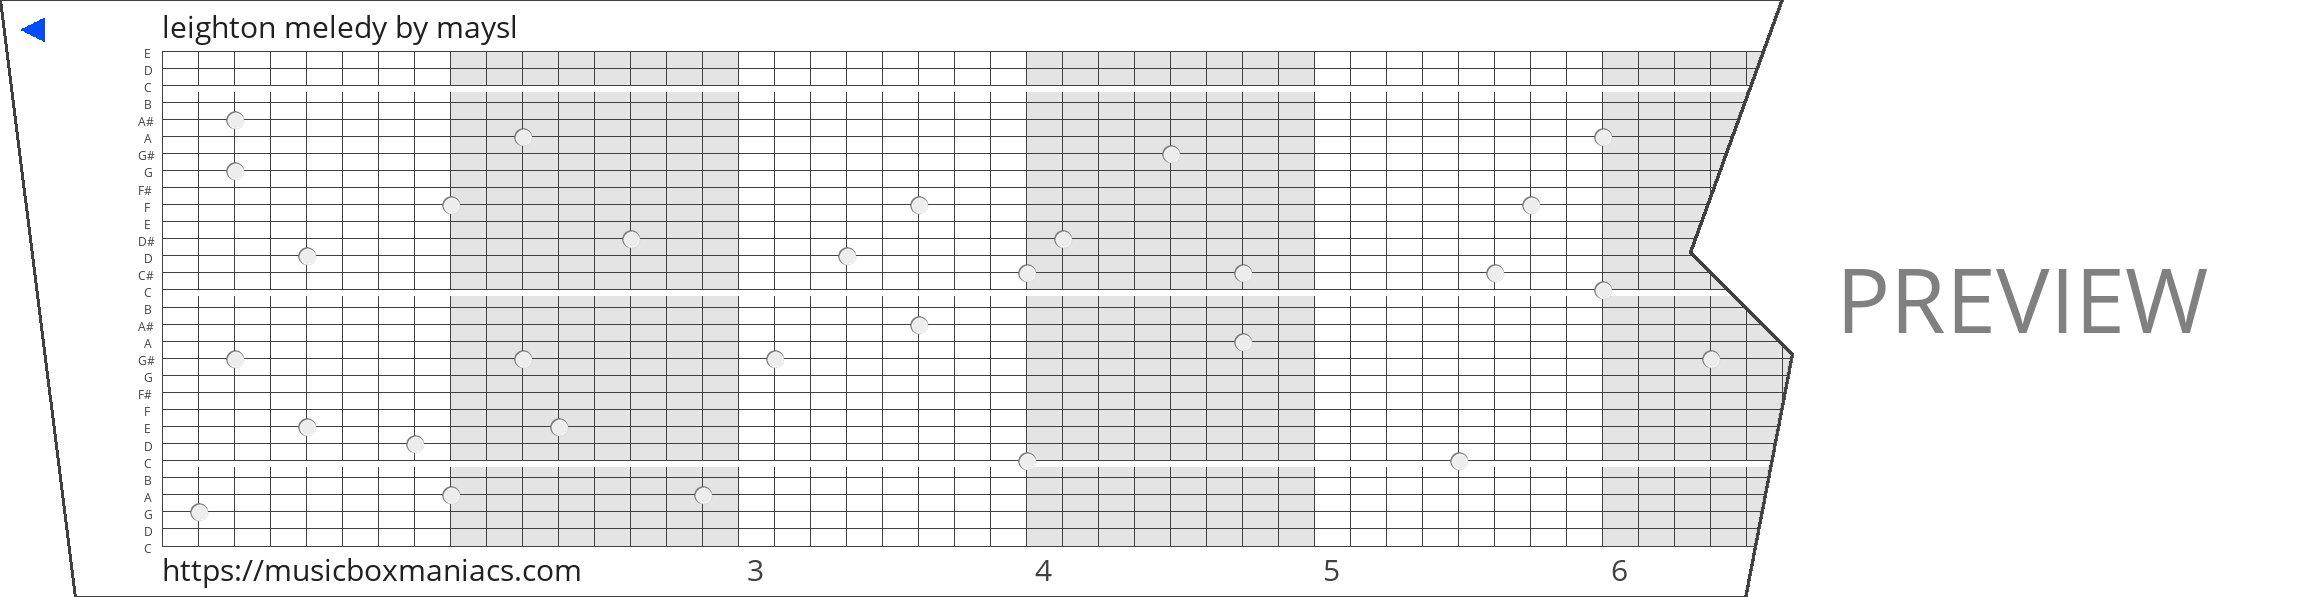 leighton meledy 30 note music box paper strip